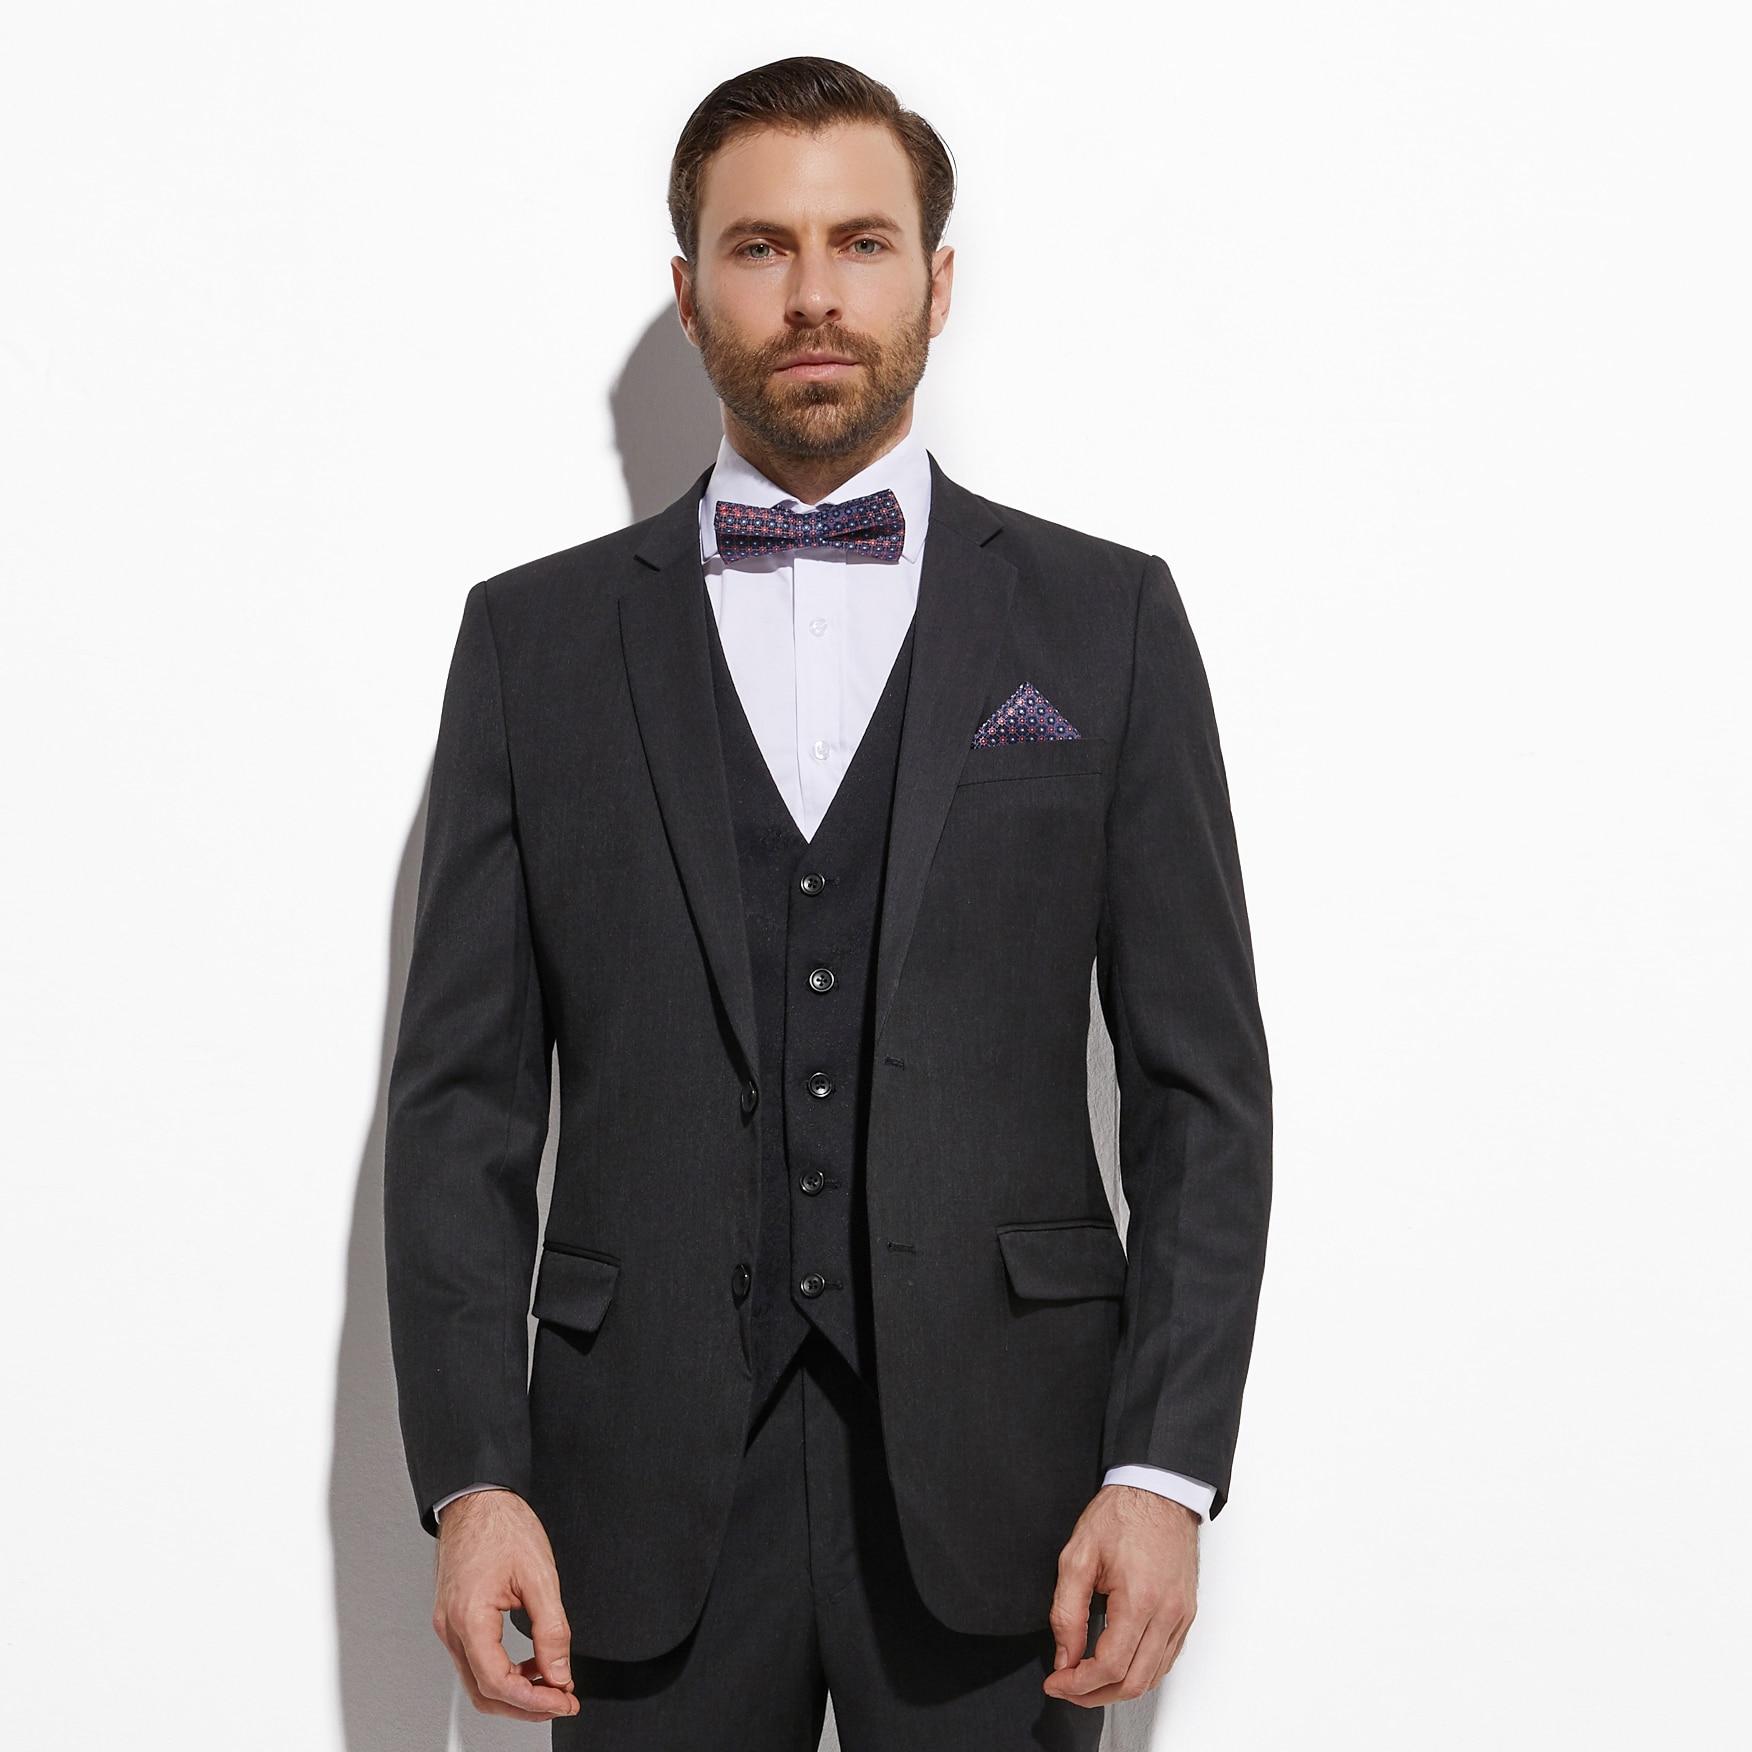 2020 Slim Fit Dark Charcoal Grey Groom Suit With Jacquard Vest Custom Made 3 piece Wedding Suits For Men  Wedding Groom Tuxedo 1